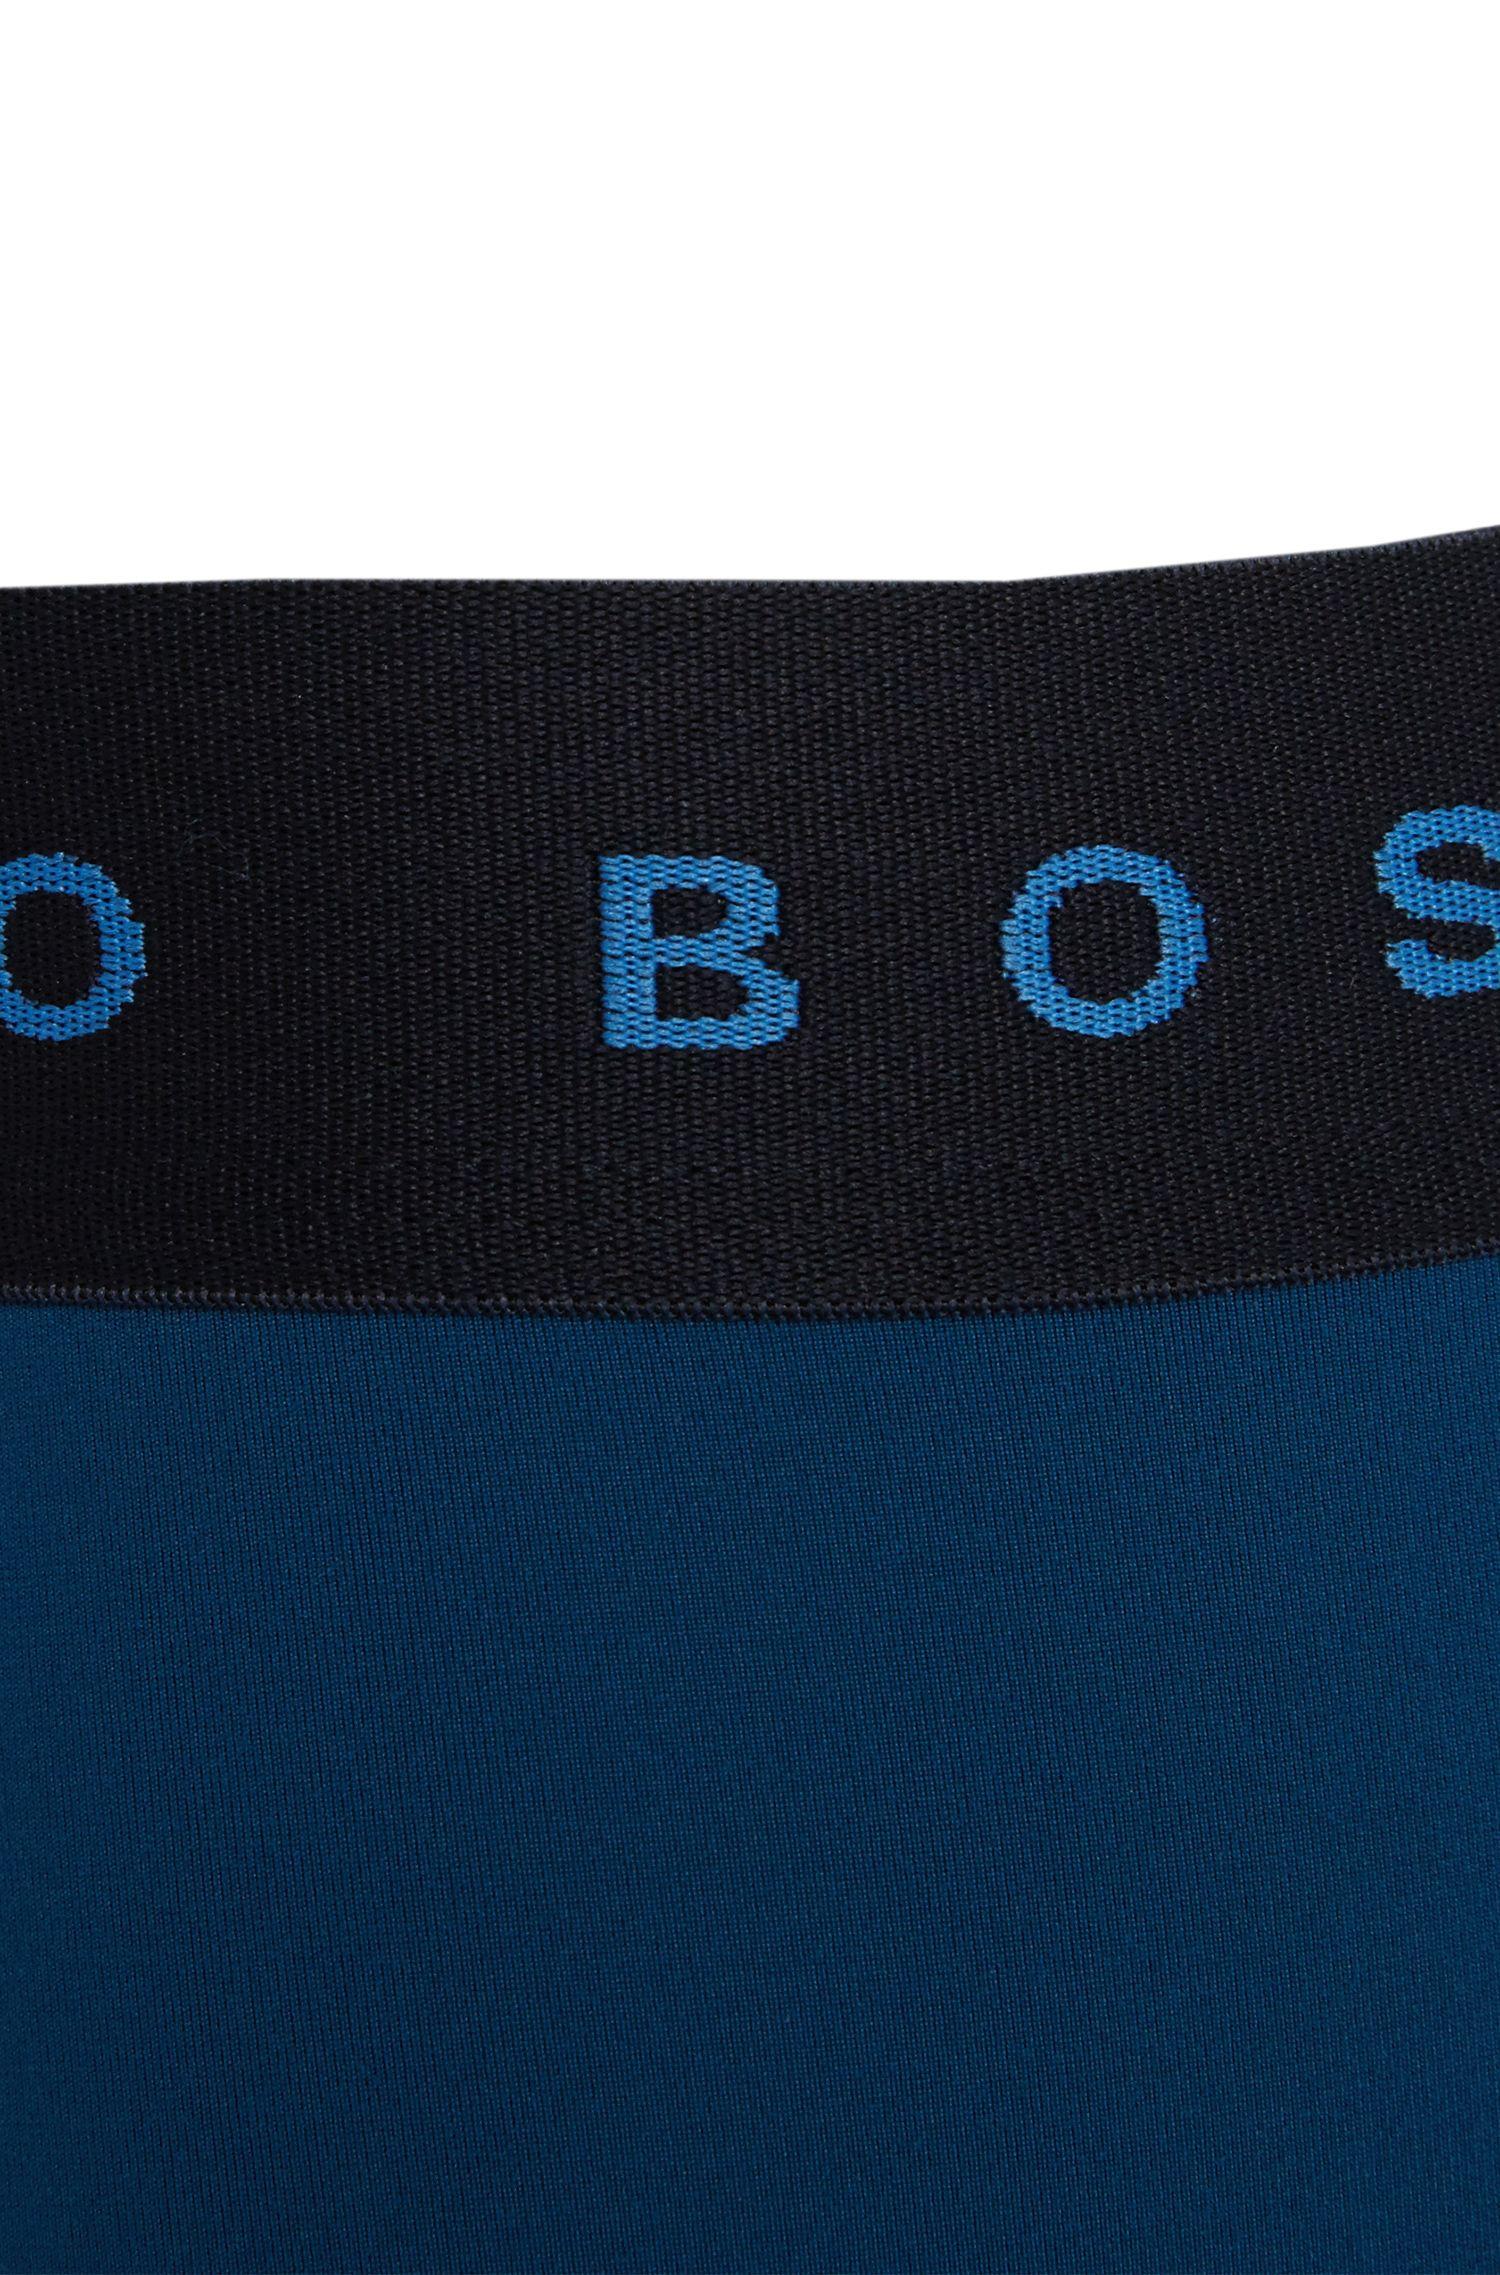 Boxershorts mit breitem Elastikbund: 'CyclistBrushed Micro'